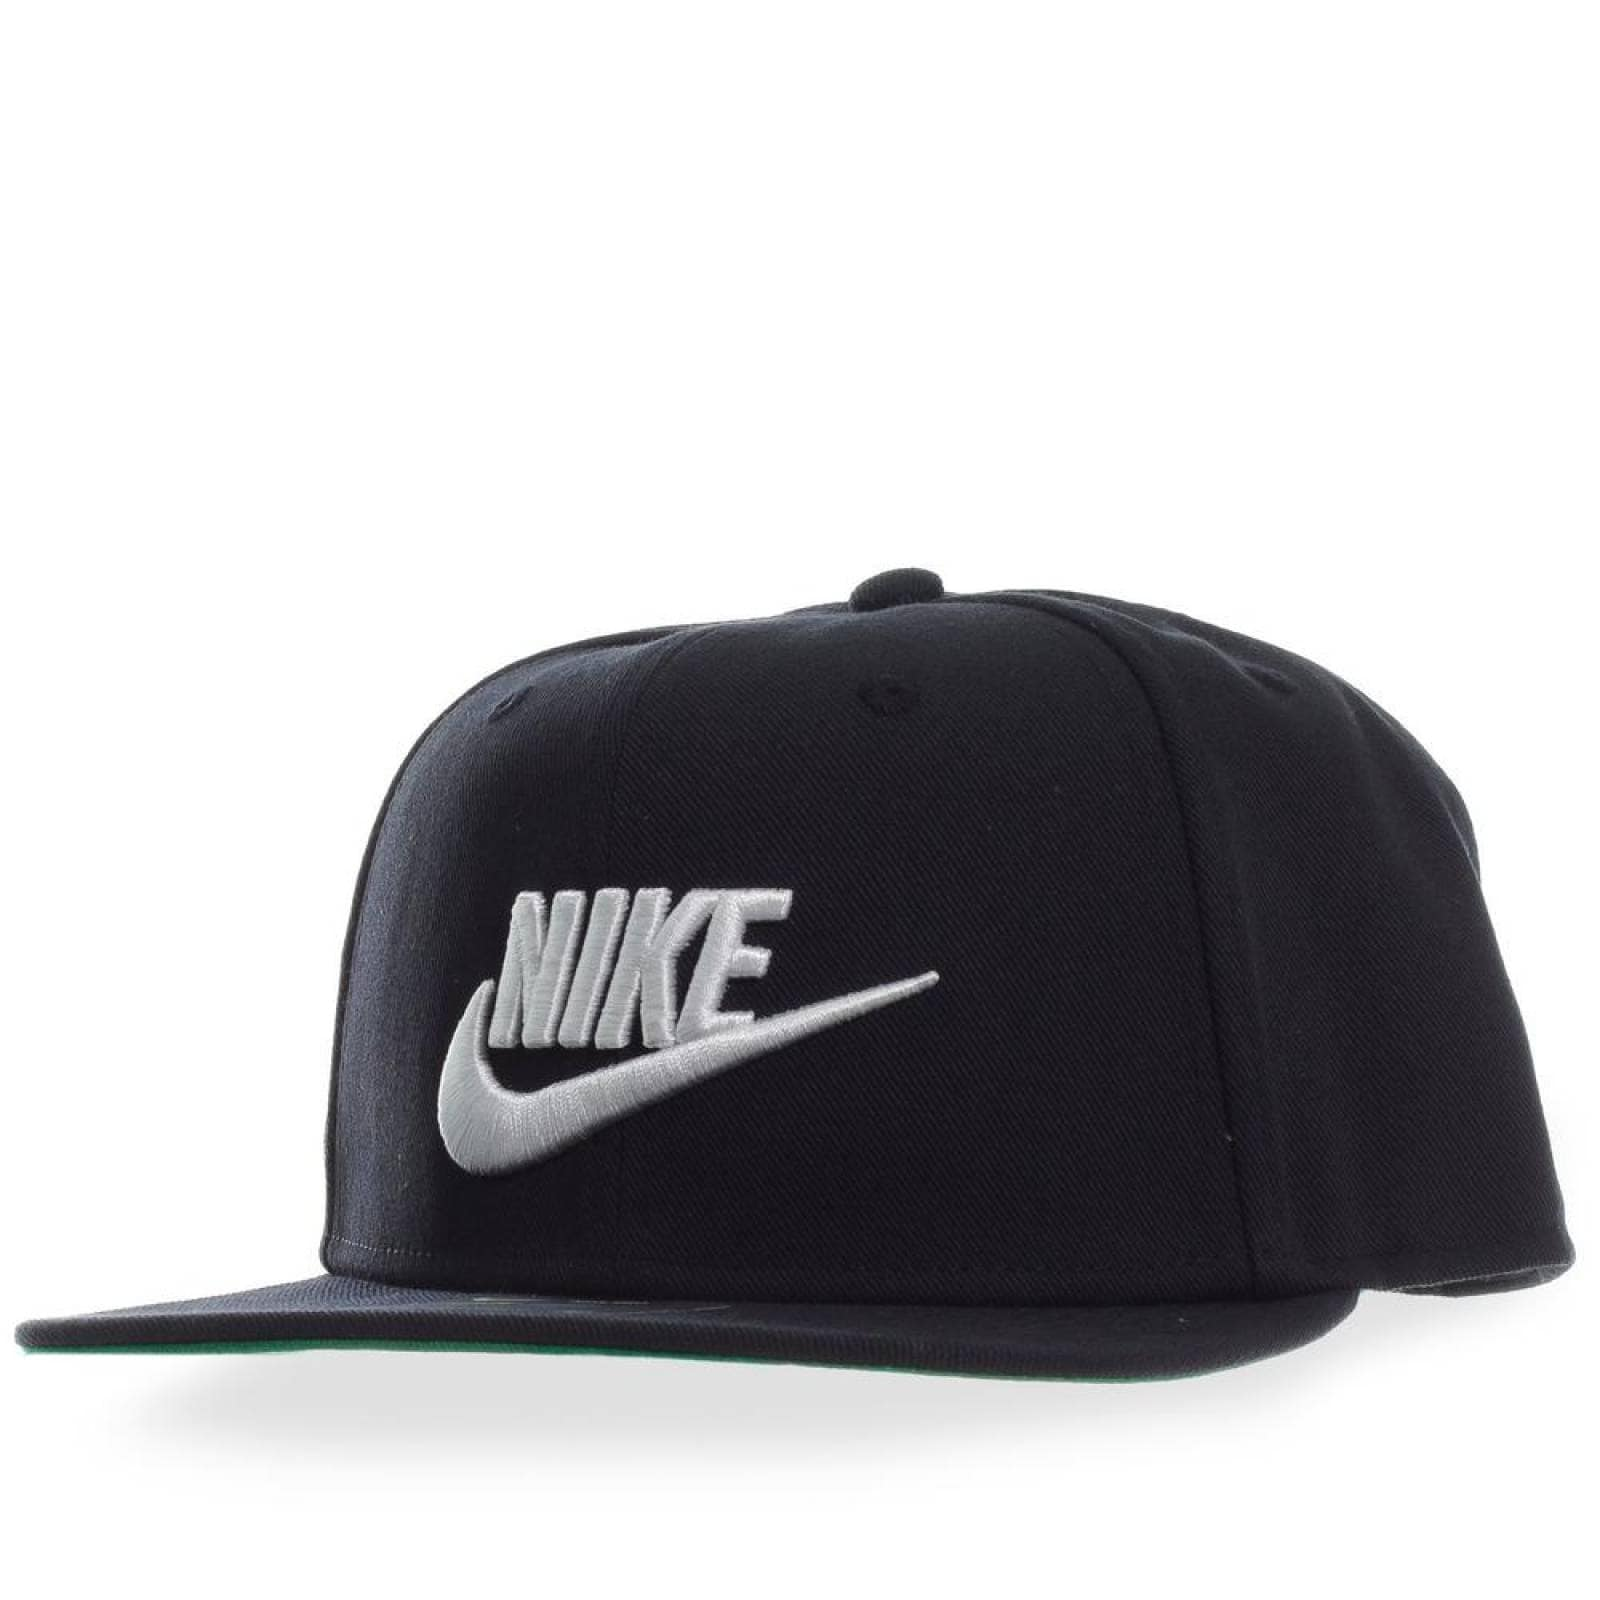 mejor 60% barato para toda la familia Gorra Nike Pro Futura - 891284010 - Negro - Unisex